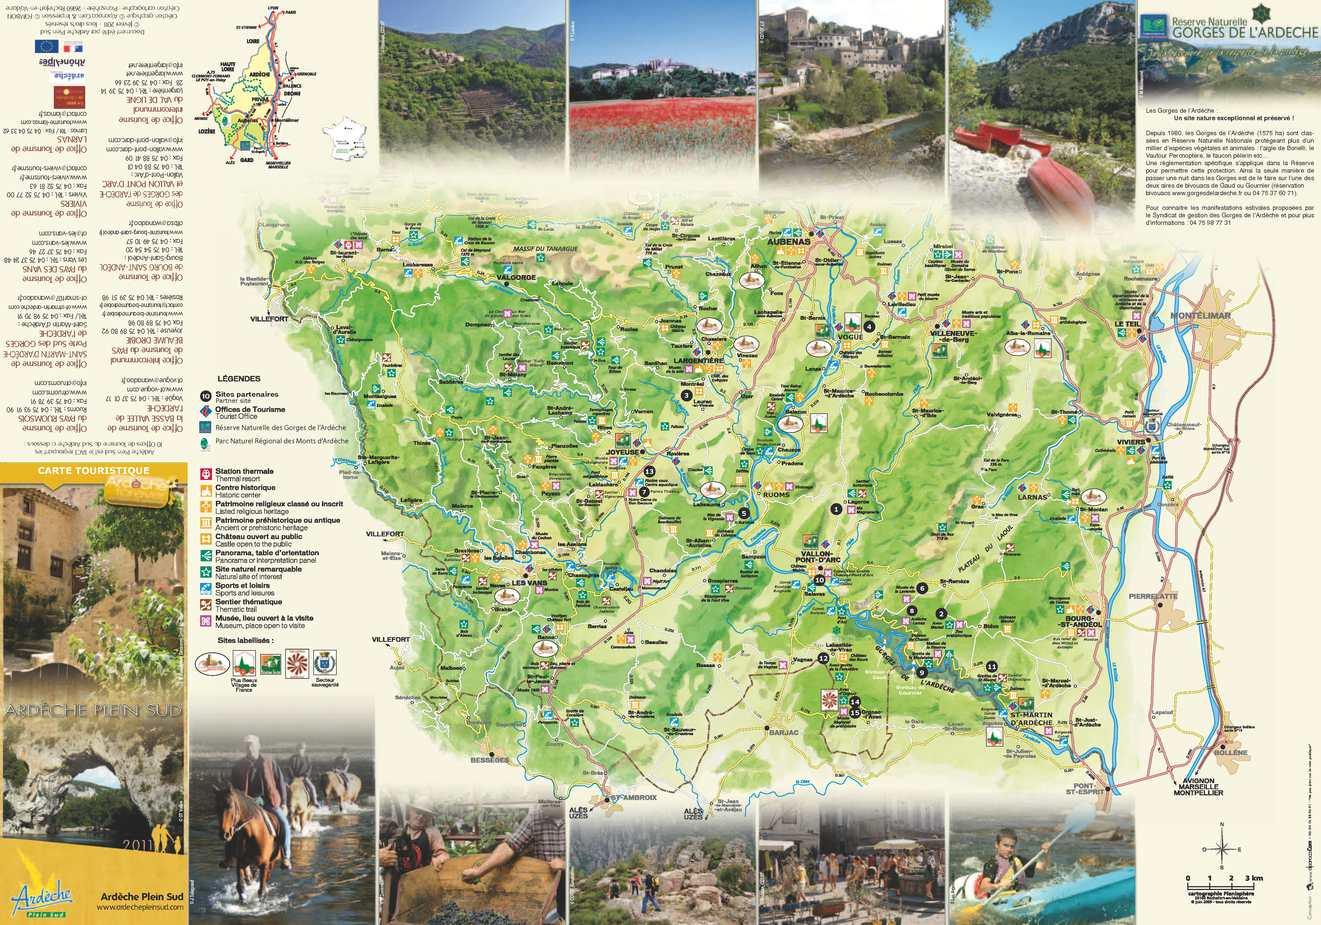 Calam o carte touristique ard che plein sud - Office tourisme saint martin d ardeche ...